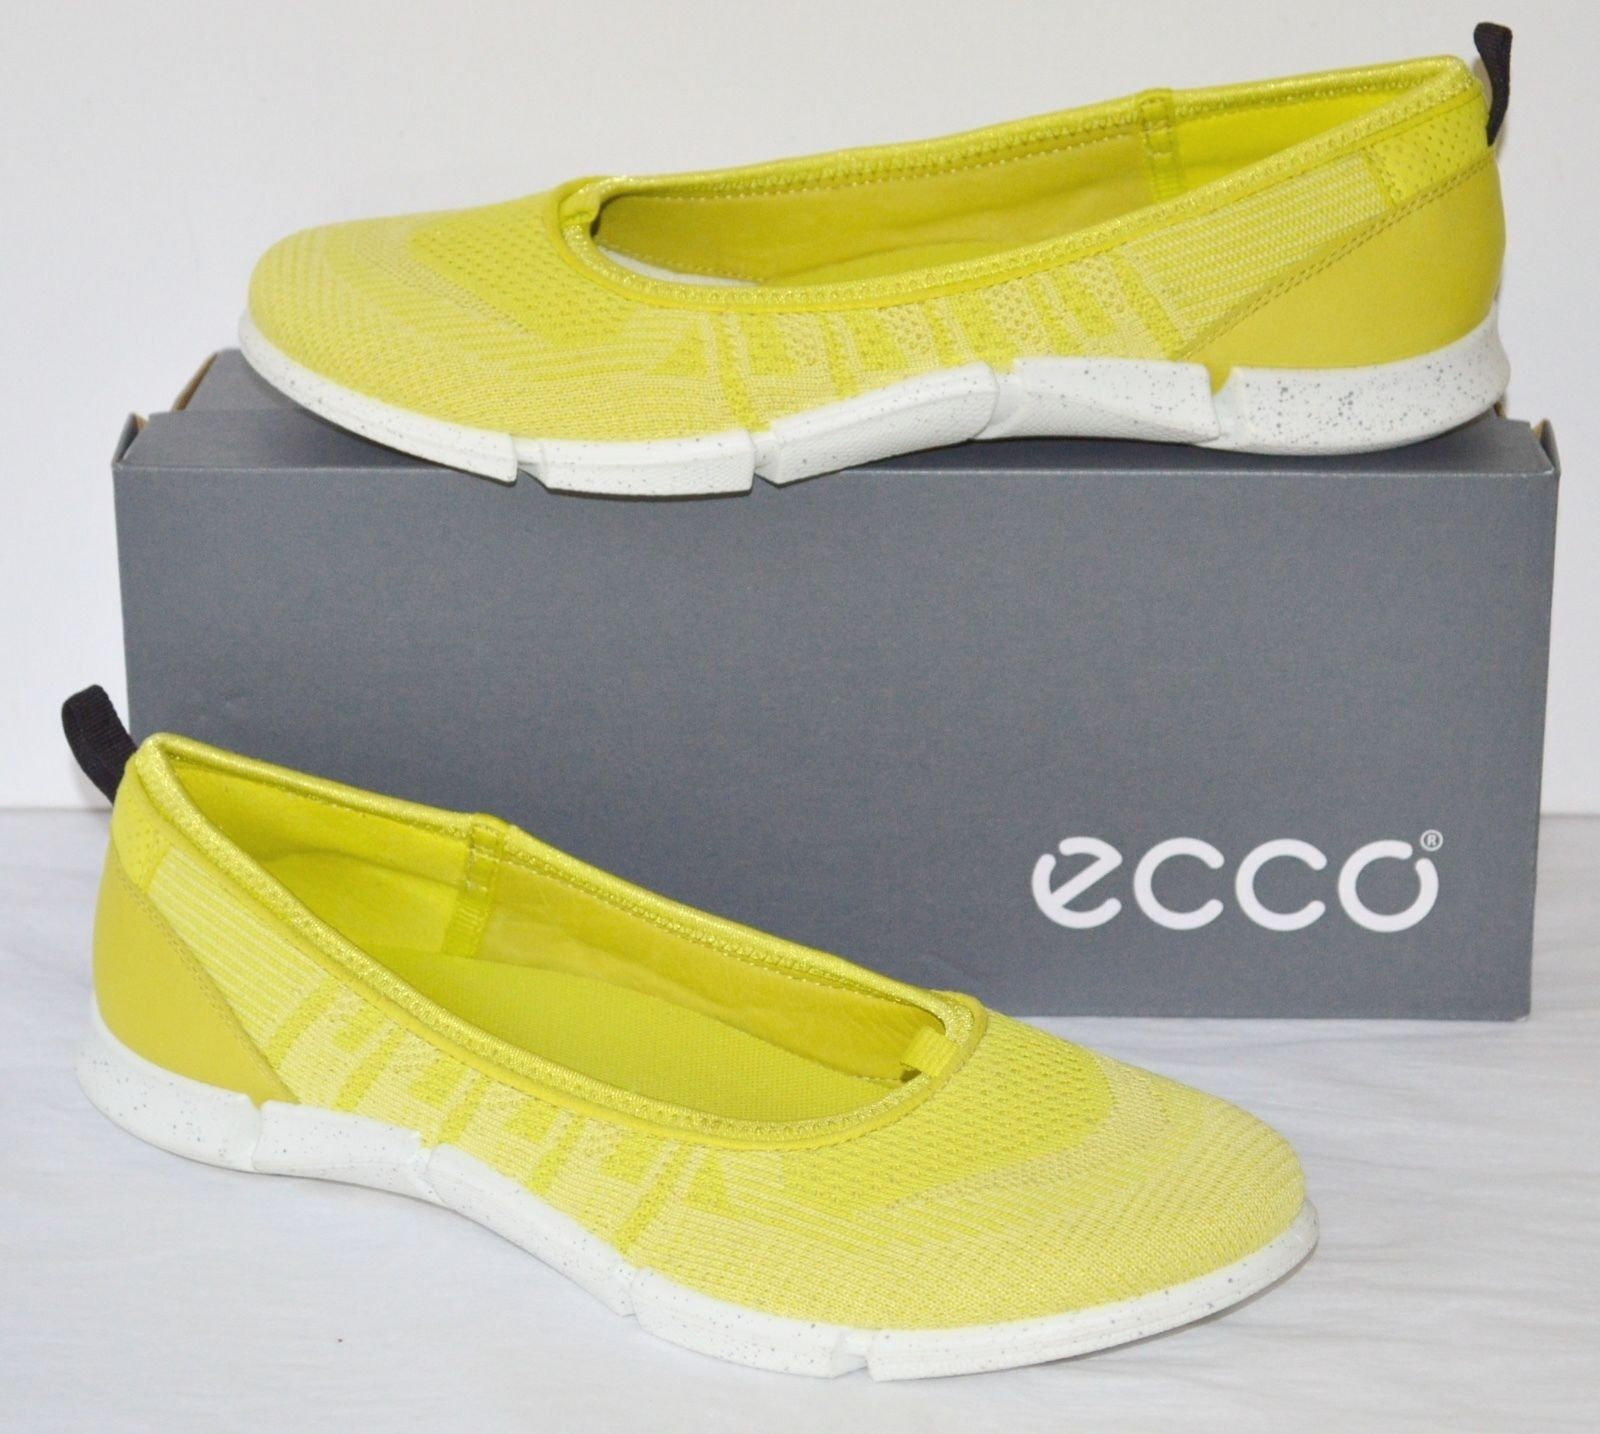 Ny  135 ECCO Intrinsic Karma Ballerina Sulphur Lemon Neon Neon Neon gul Slip on sz 10  fantastiska färgvägar